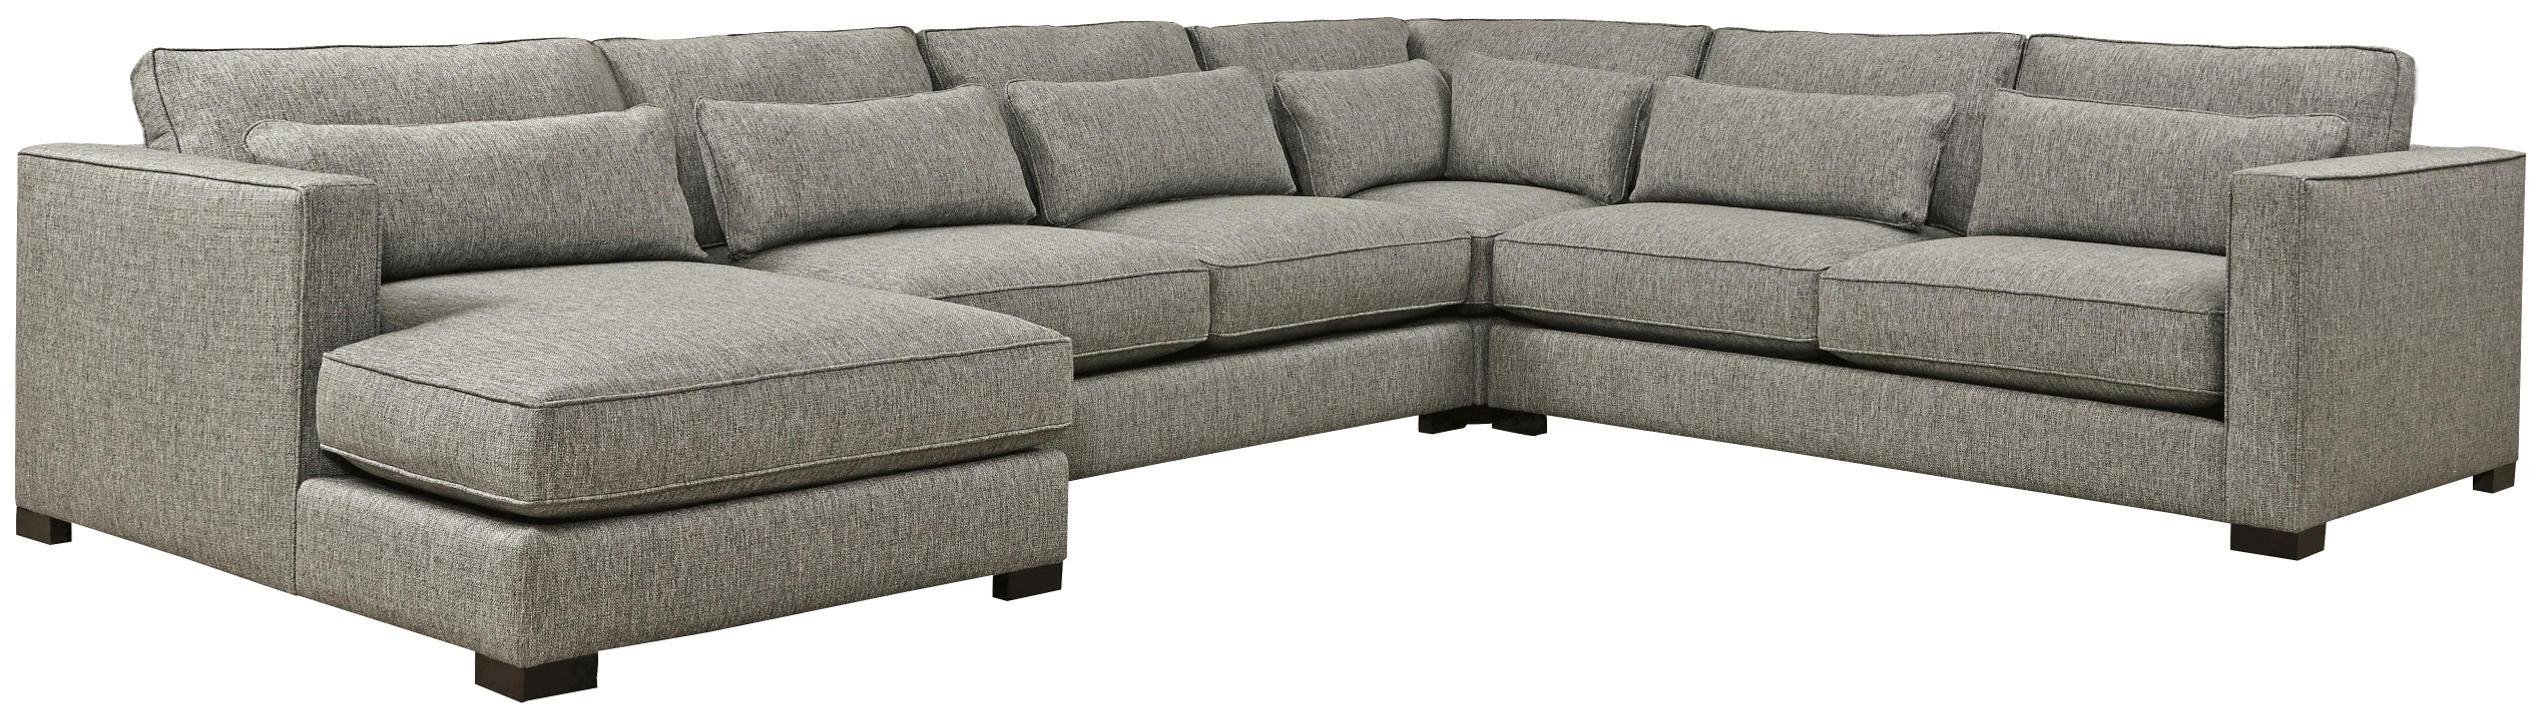 4 Piece Sectional | Soft Fabrics, Detroit And Pillows Regarding Sectional Sofas Art Van (View 7 of 15)